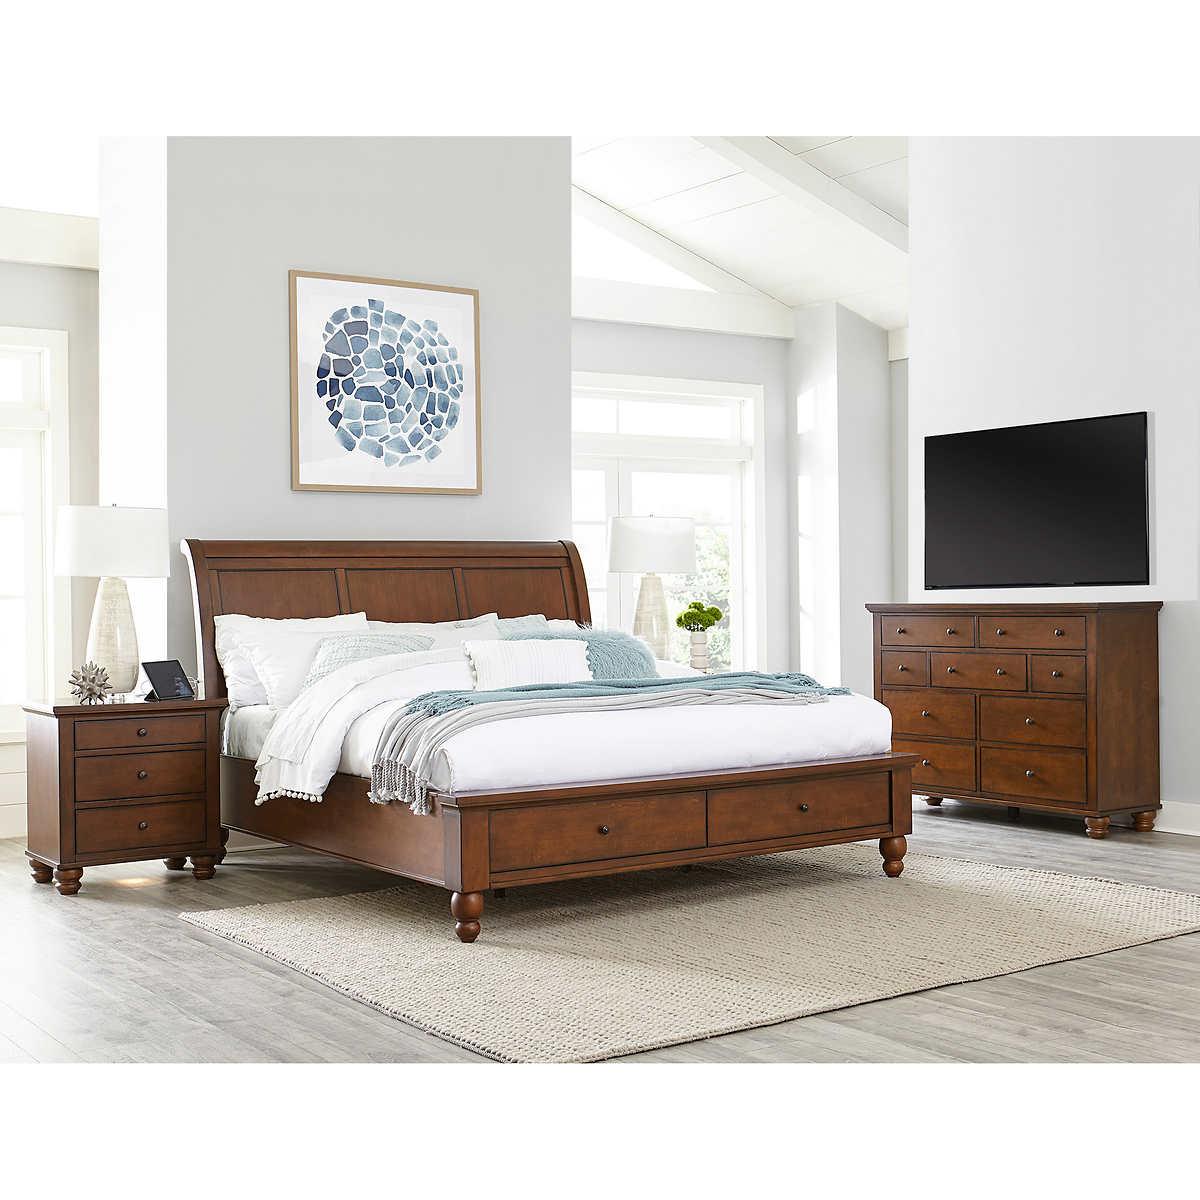 Queen bedroom sets with storage - Ashfield 4 Piece Queen Storage Bedroom Set